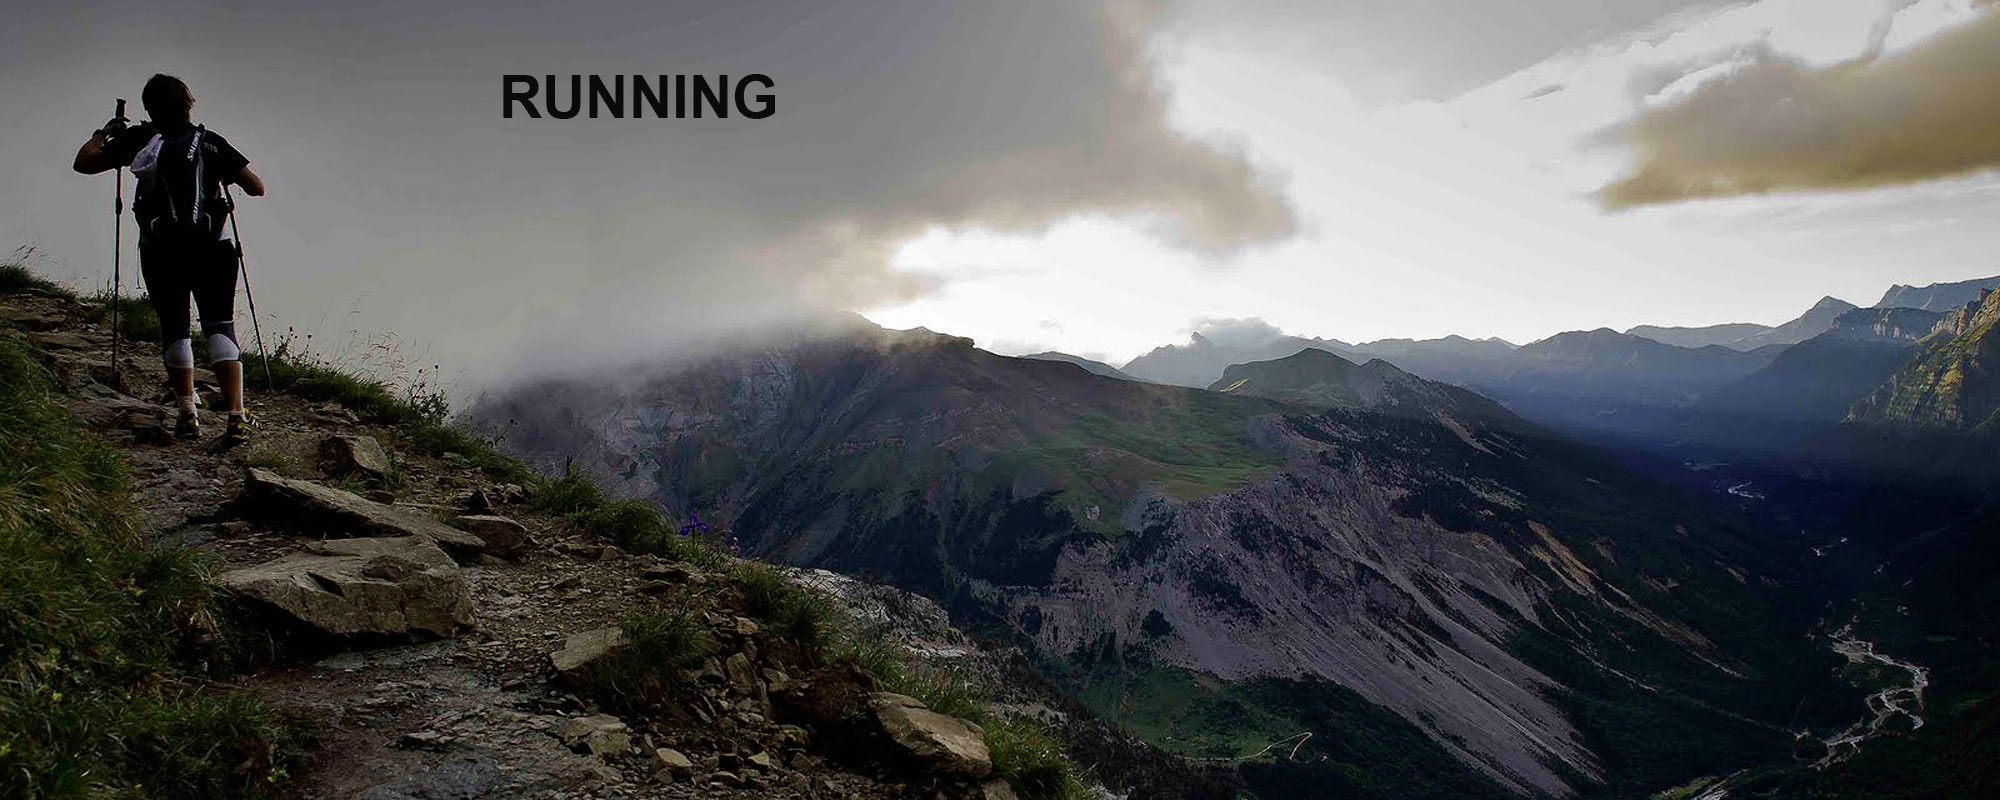 running-monte-perdido-extrem